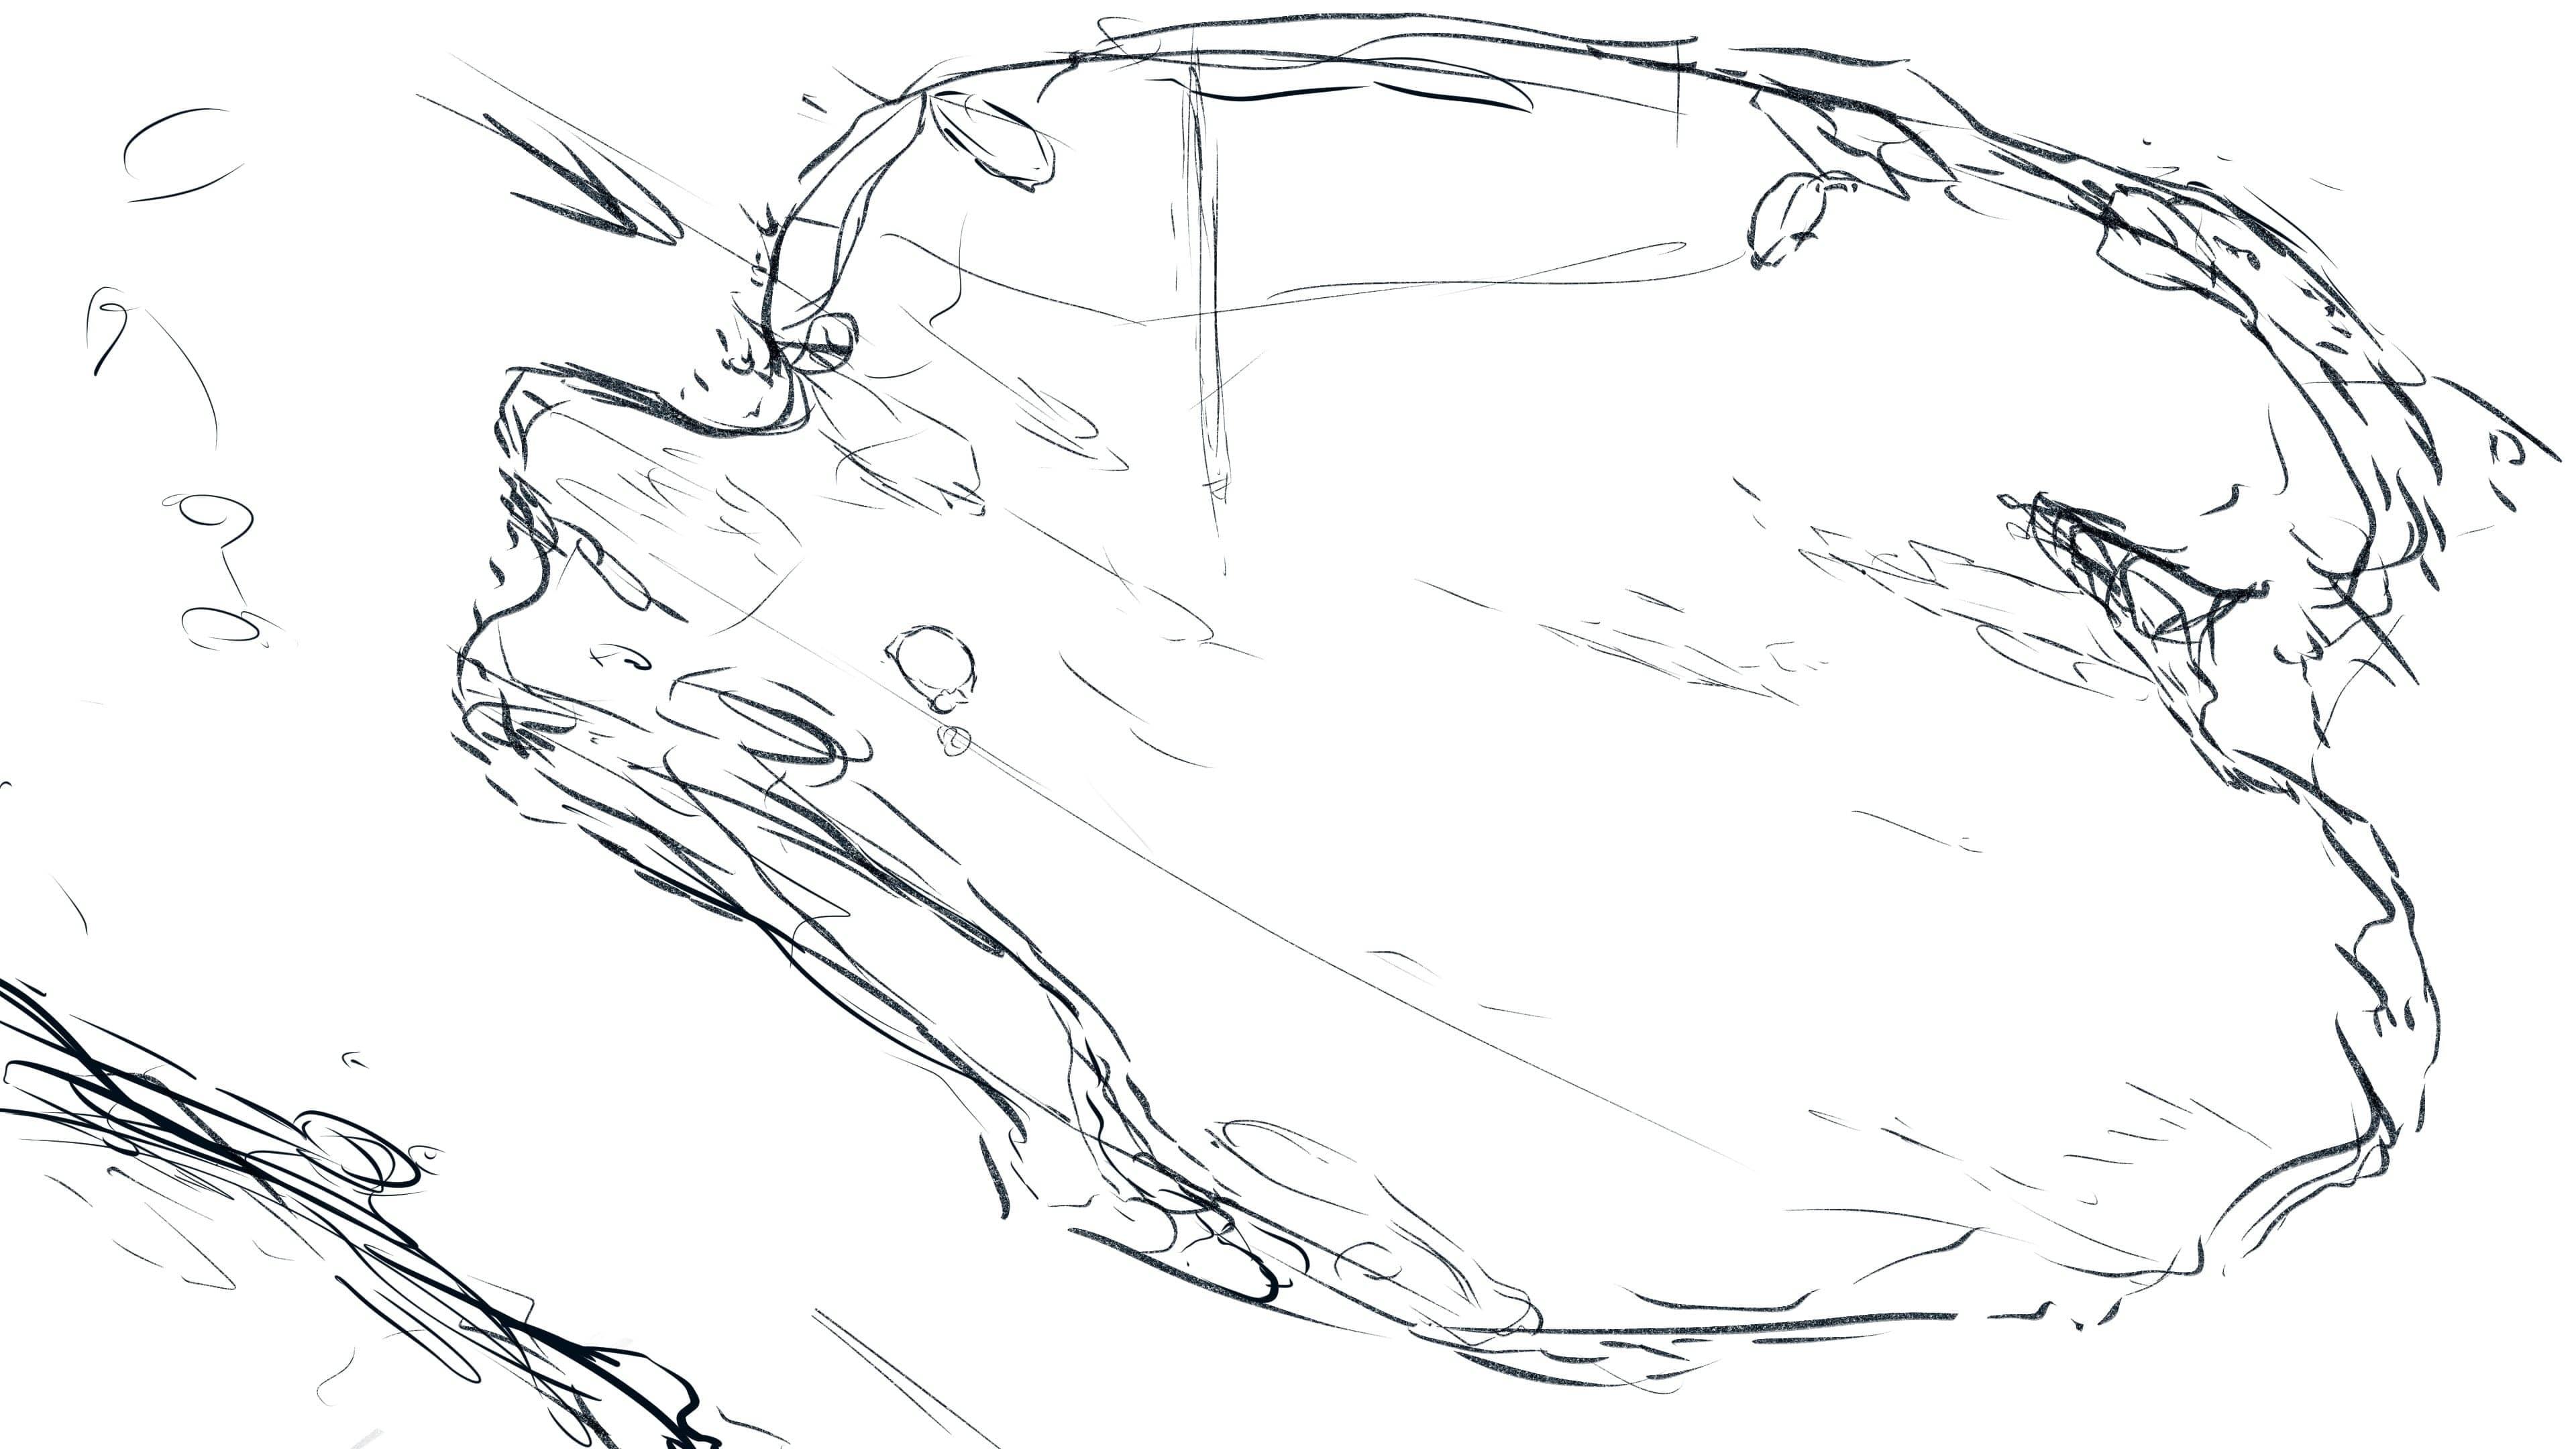 [CLIP STUDIO PAINT] How to Draw a Digital Landscape